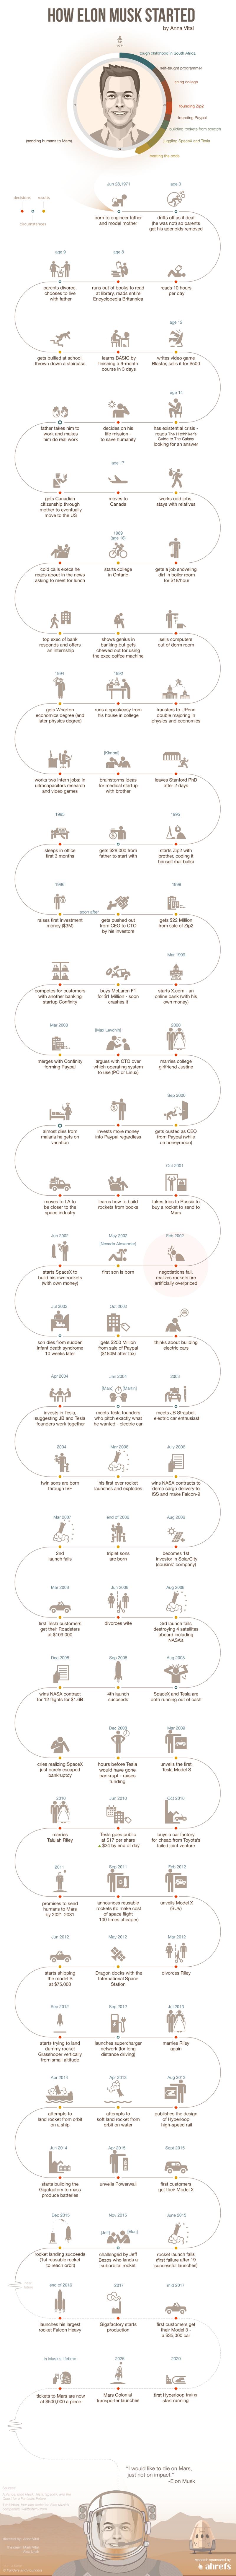 How Elon Musk Built His Net Worth To 12 1 Billion Elon Musk Infographic Elon Musk Biography